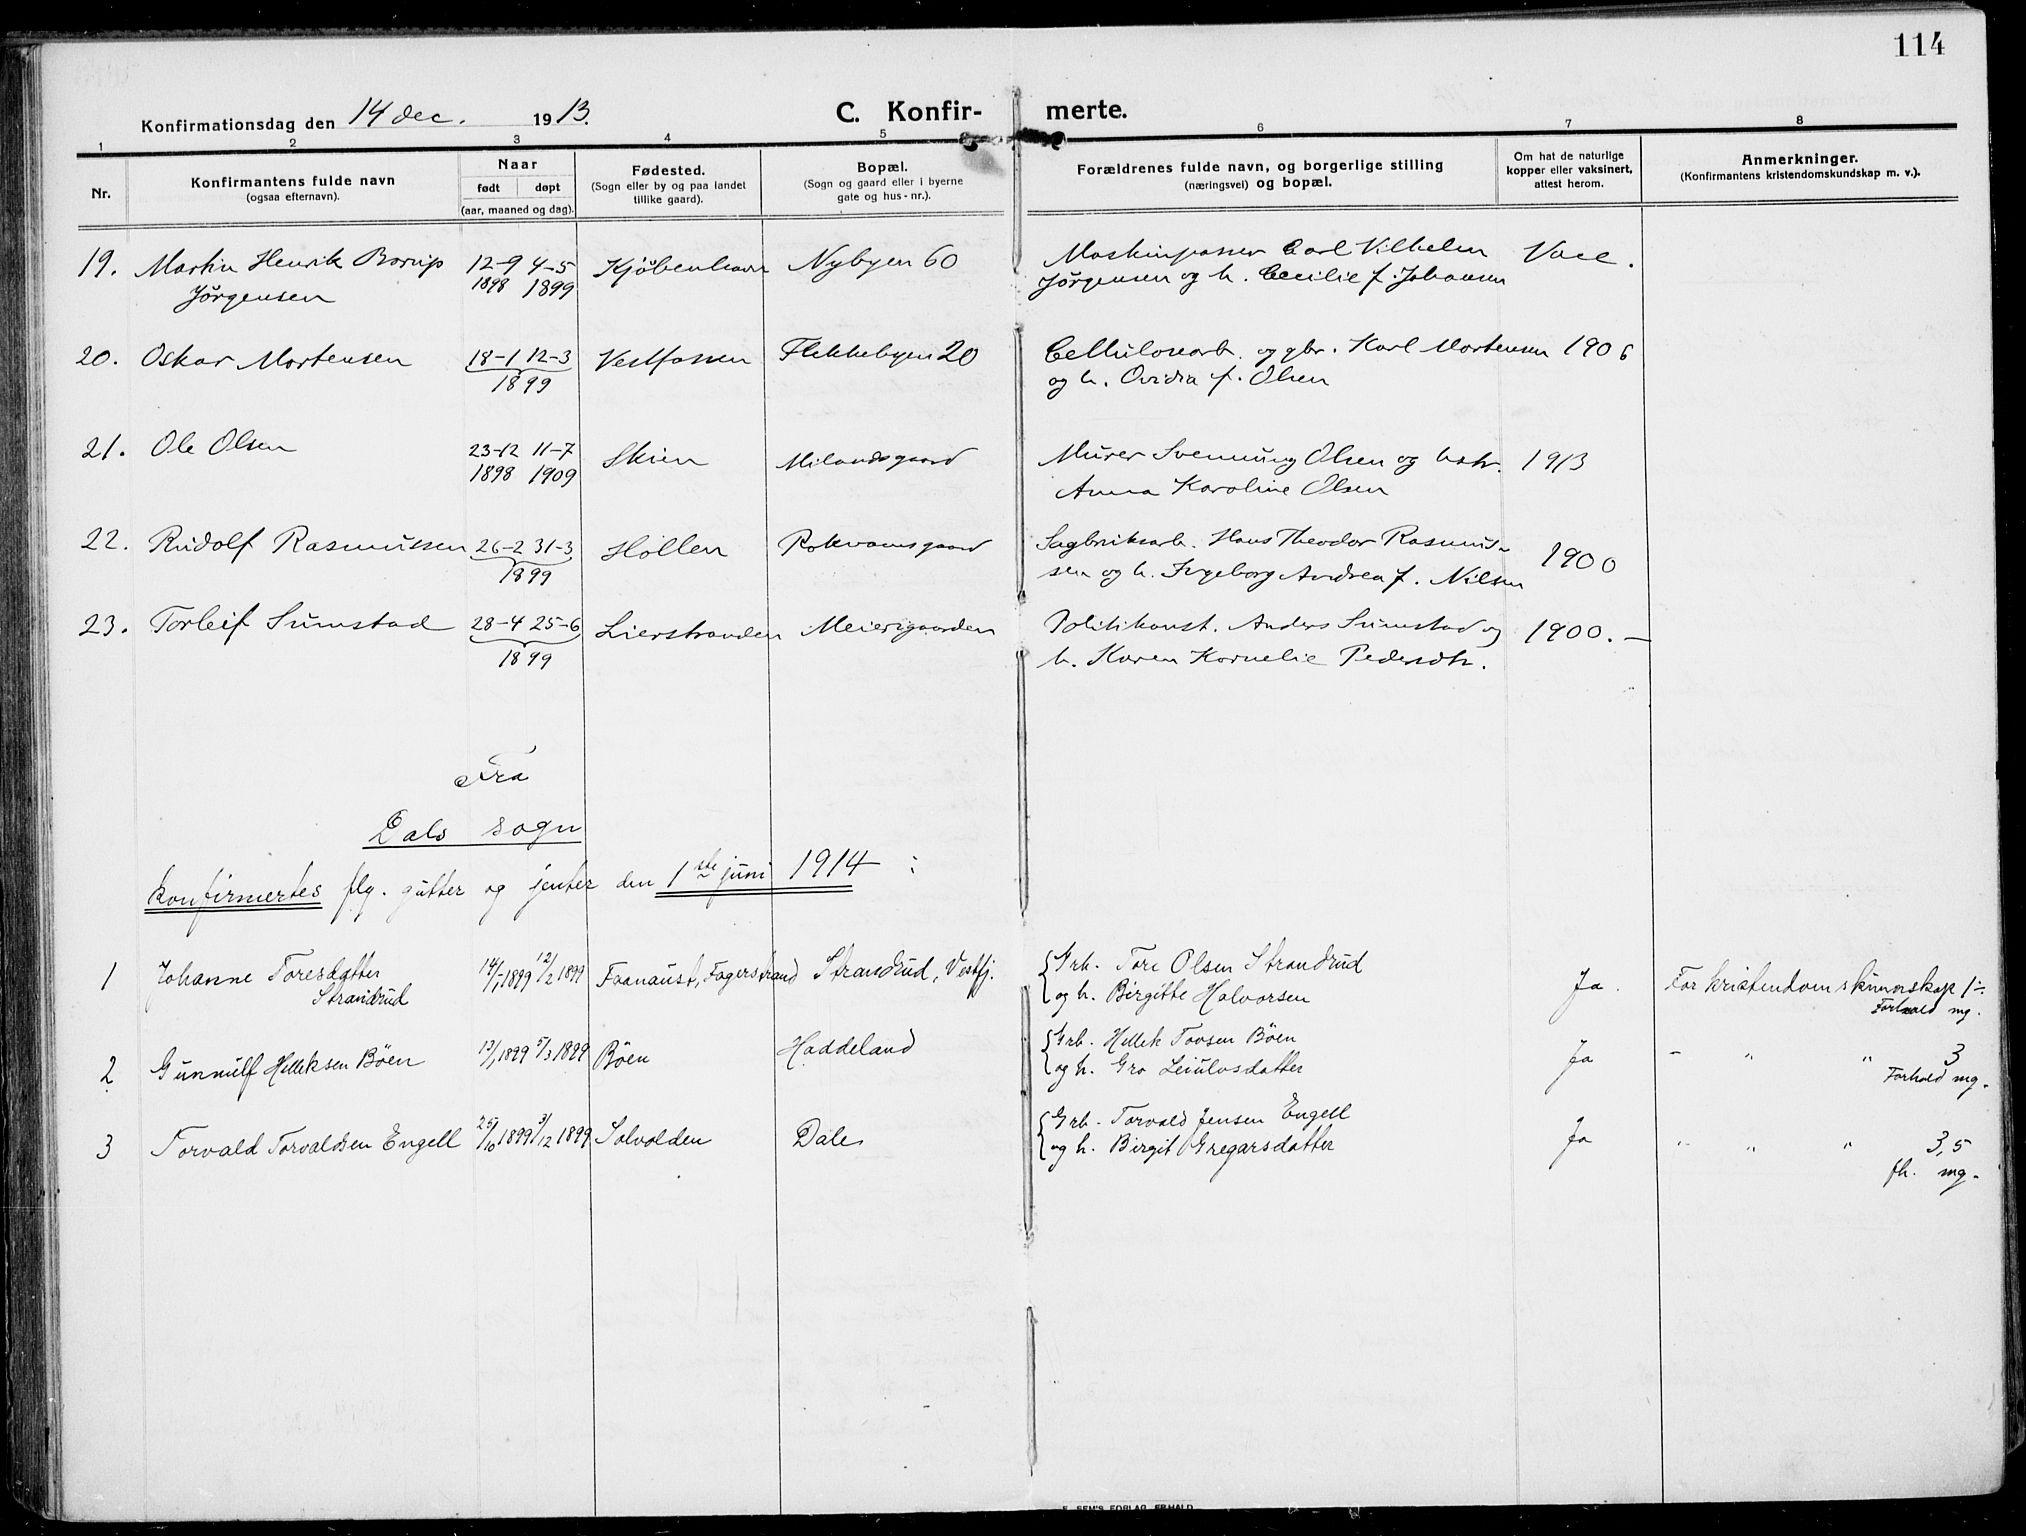 SAKO, Rjukan kirkebøker, F/Fa/L0002: Ministerialbok nr. 2, 1912-1917, s. 114